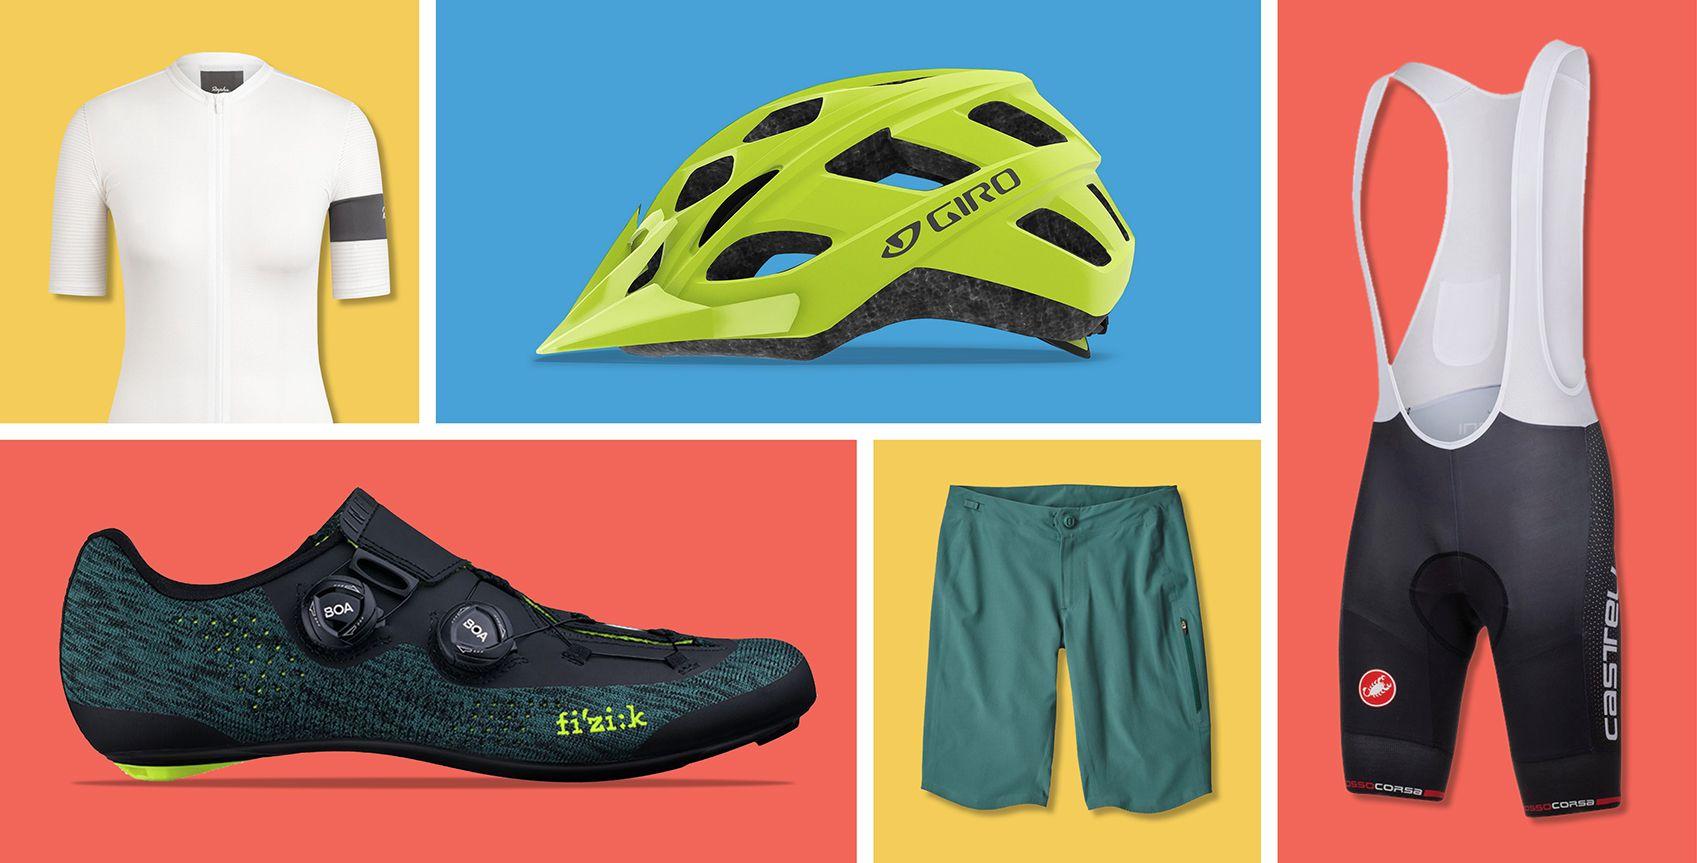 Pearl iZUMi Sun Legs White X-Large Cycling Sun Protection Lightweight